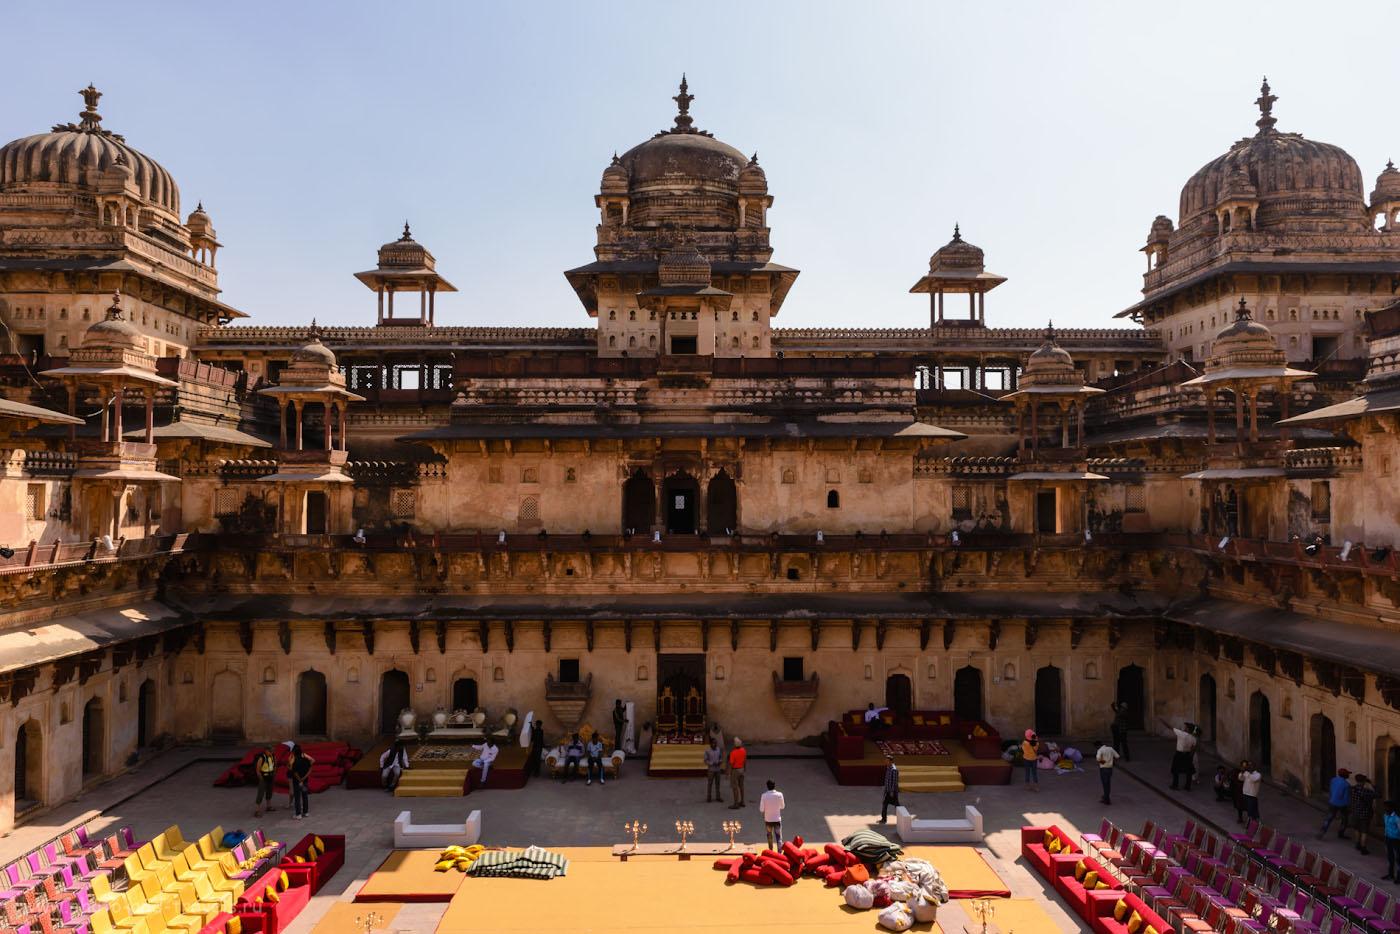 Снимок 5. Внутренний дворик дворца Джахангир-Махал в Орчхе.